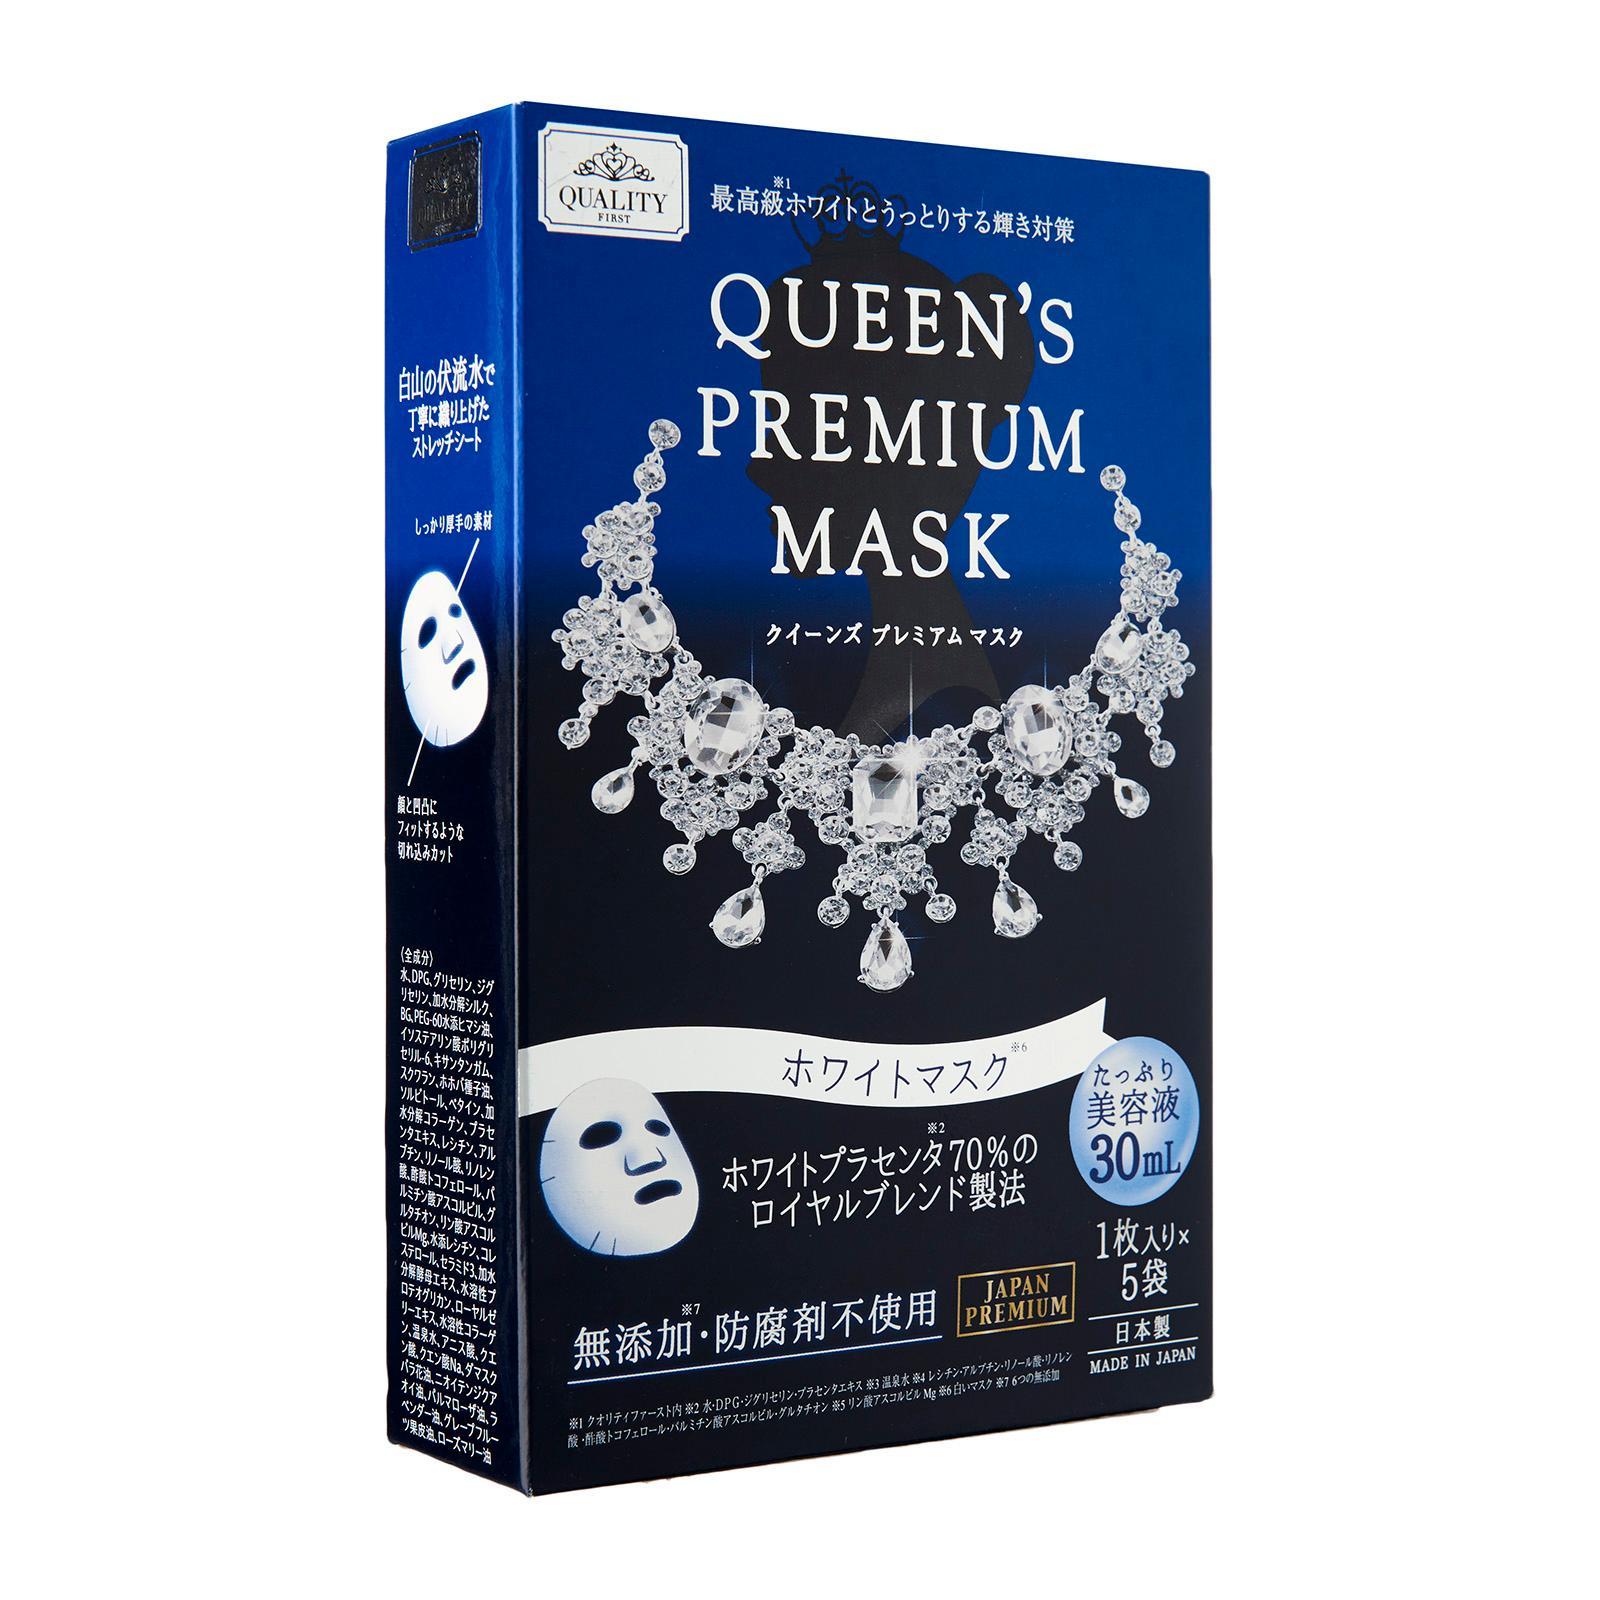 Quality-1St-Queens-Premium-Mask-Whitening